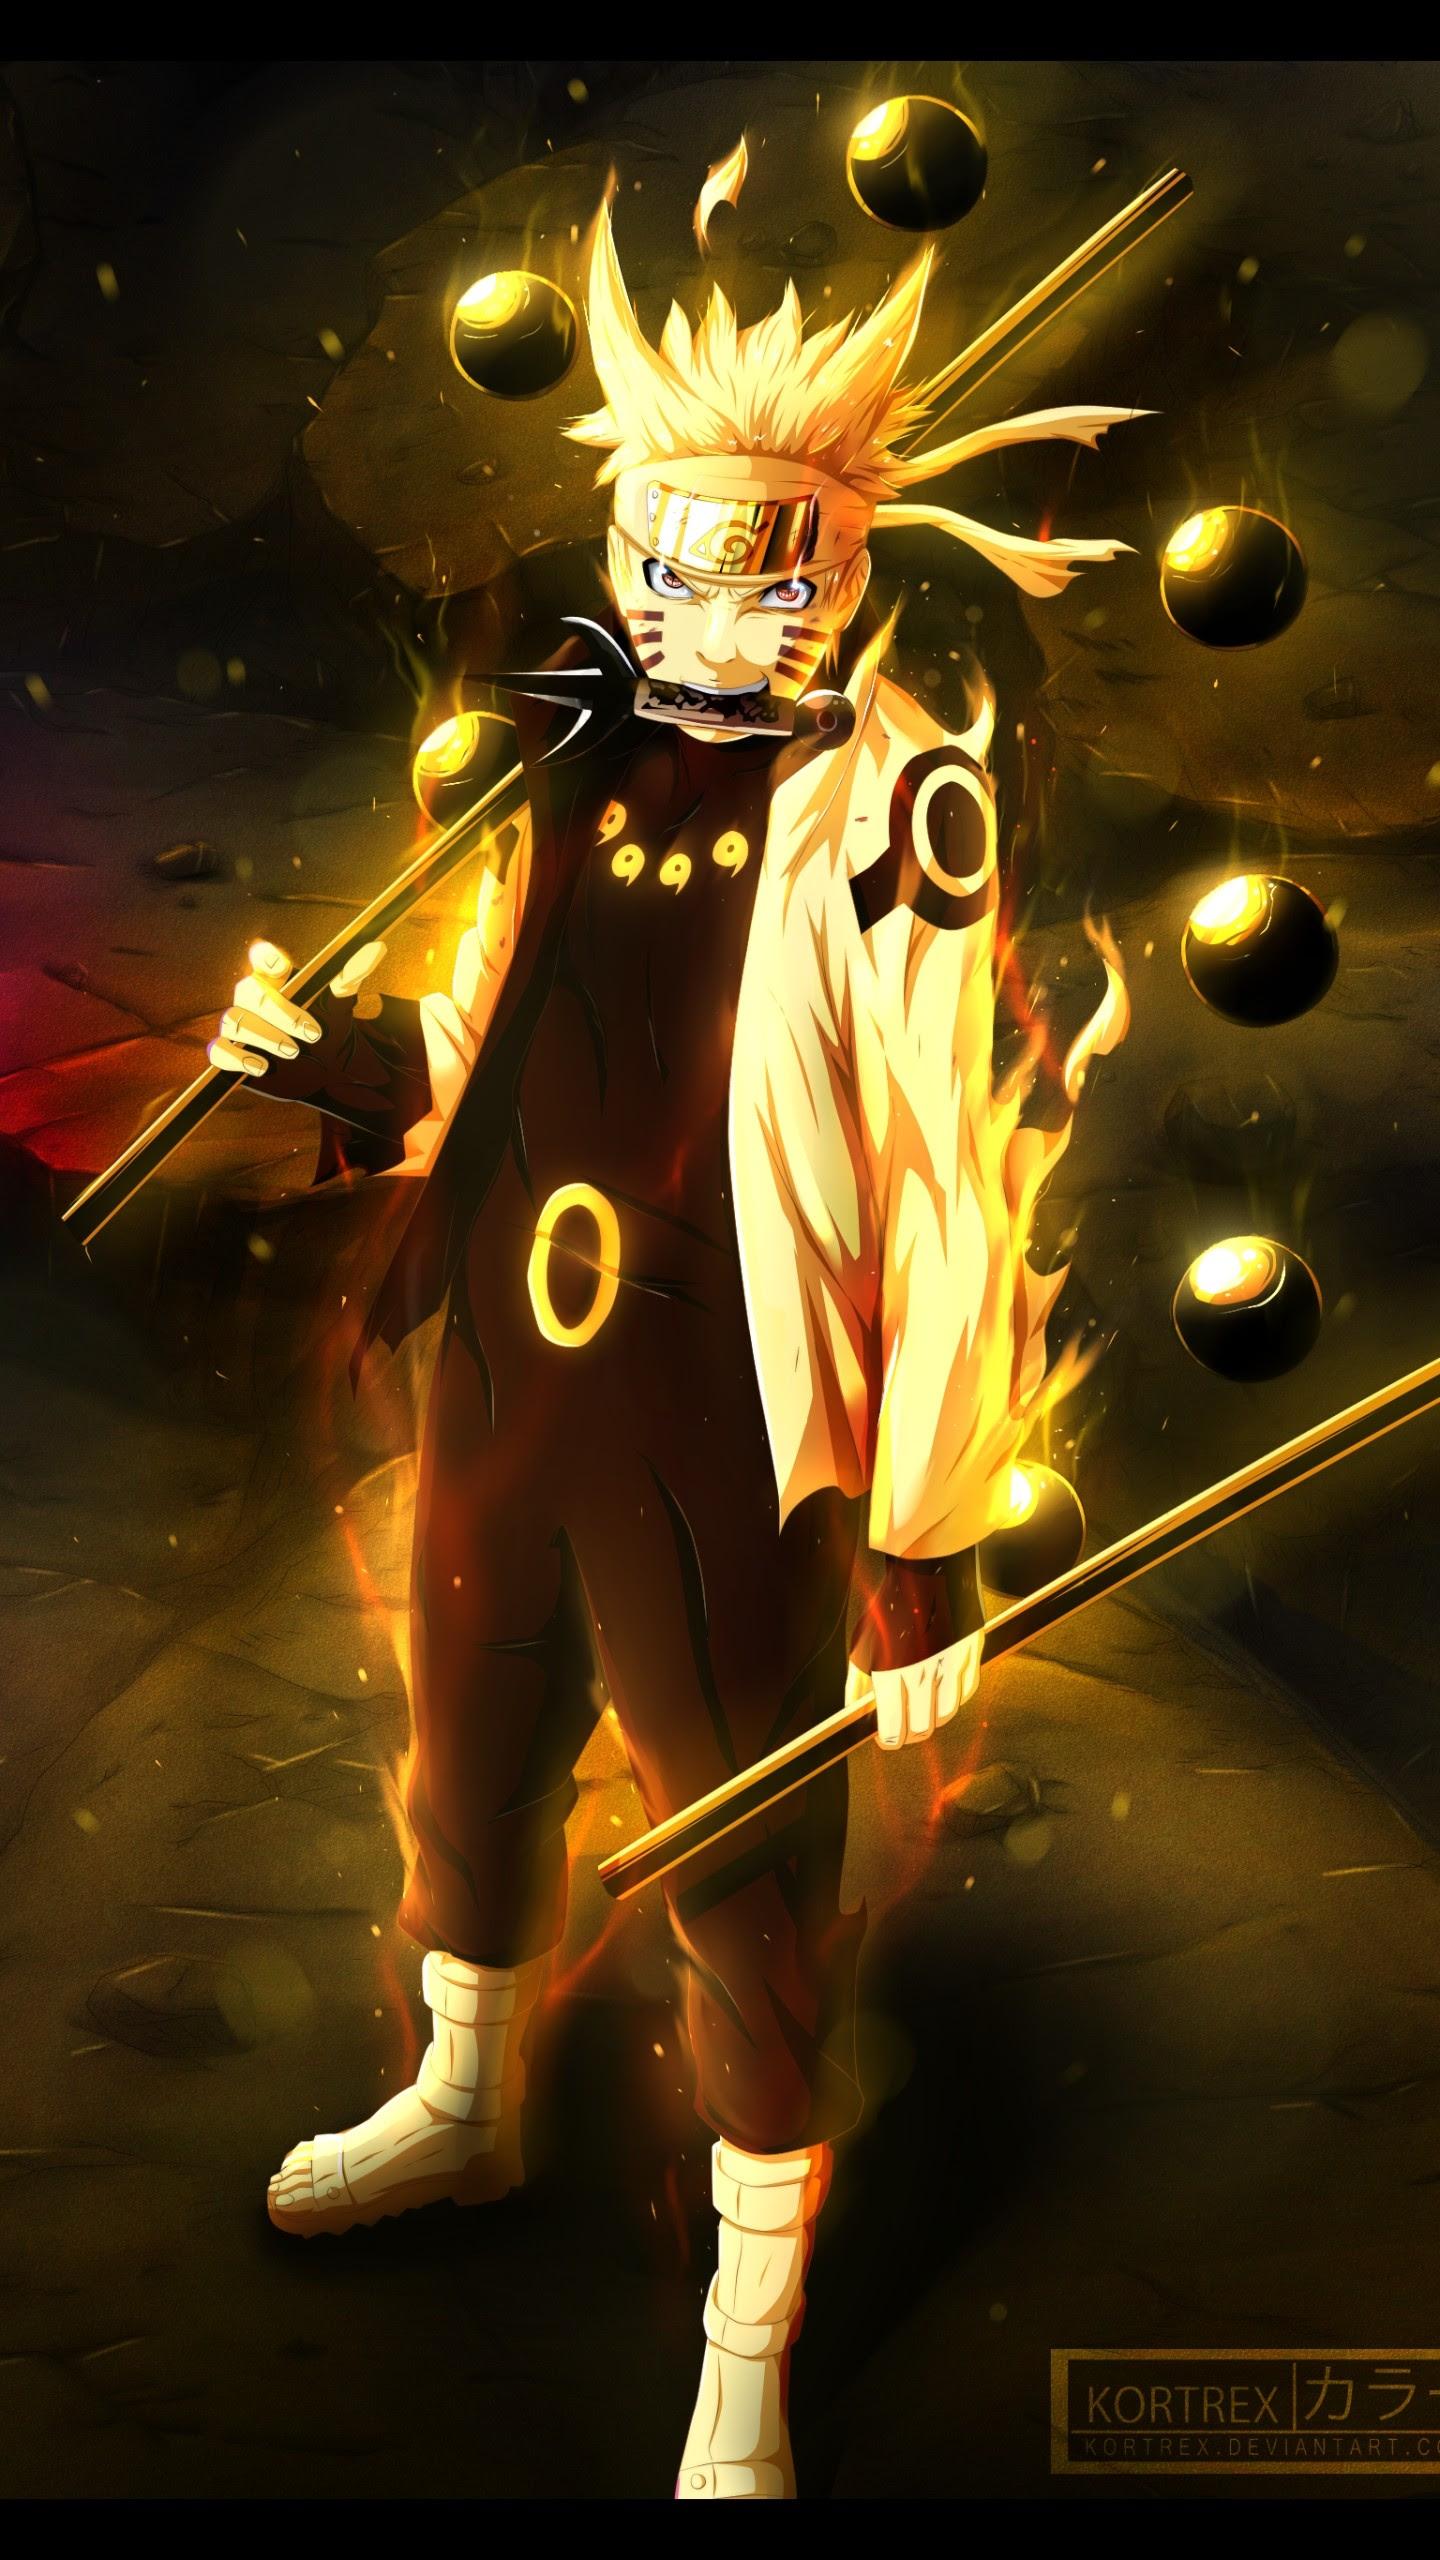 Naruto Wallpapers Hd 2018 63 Images